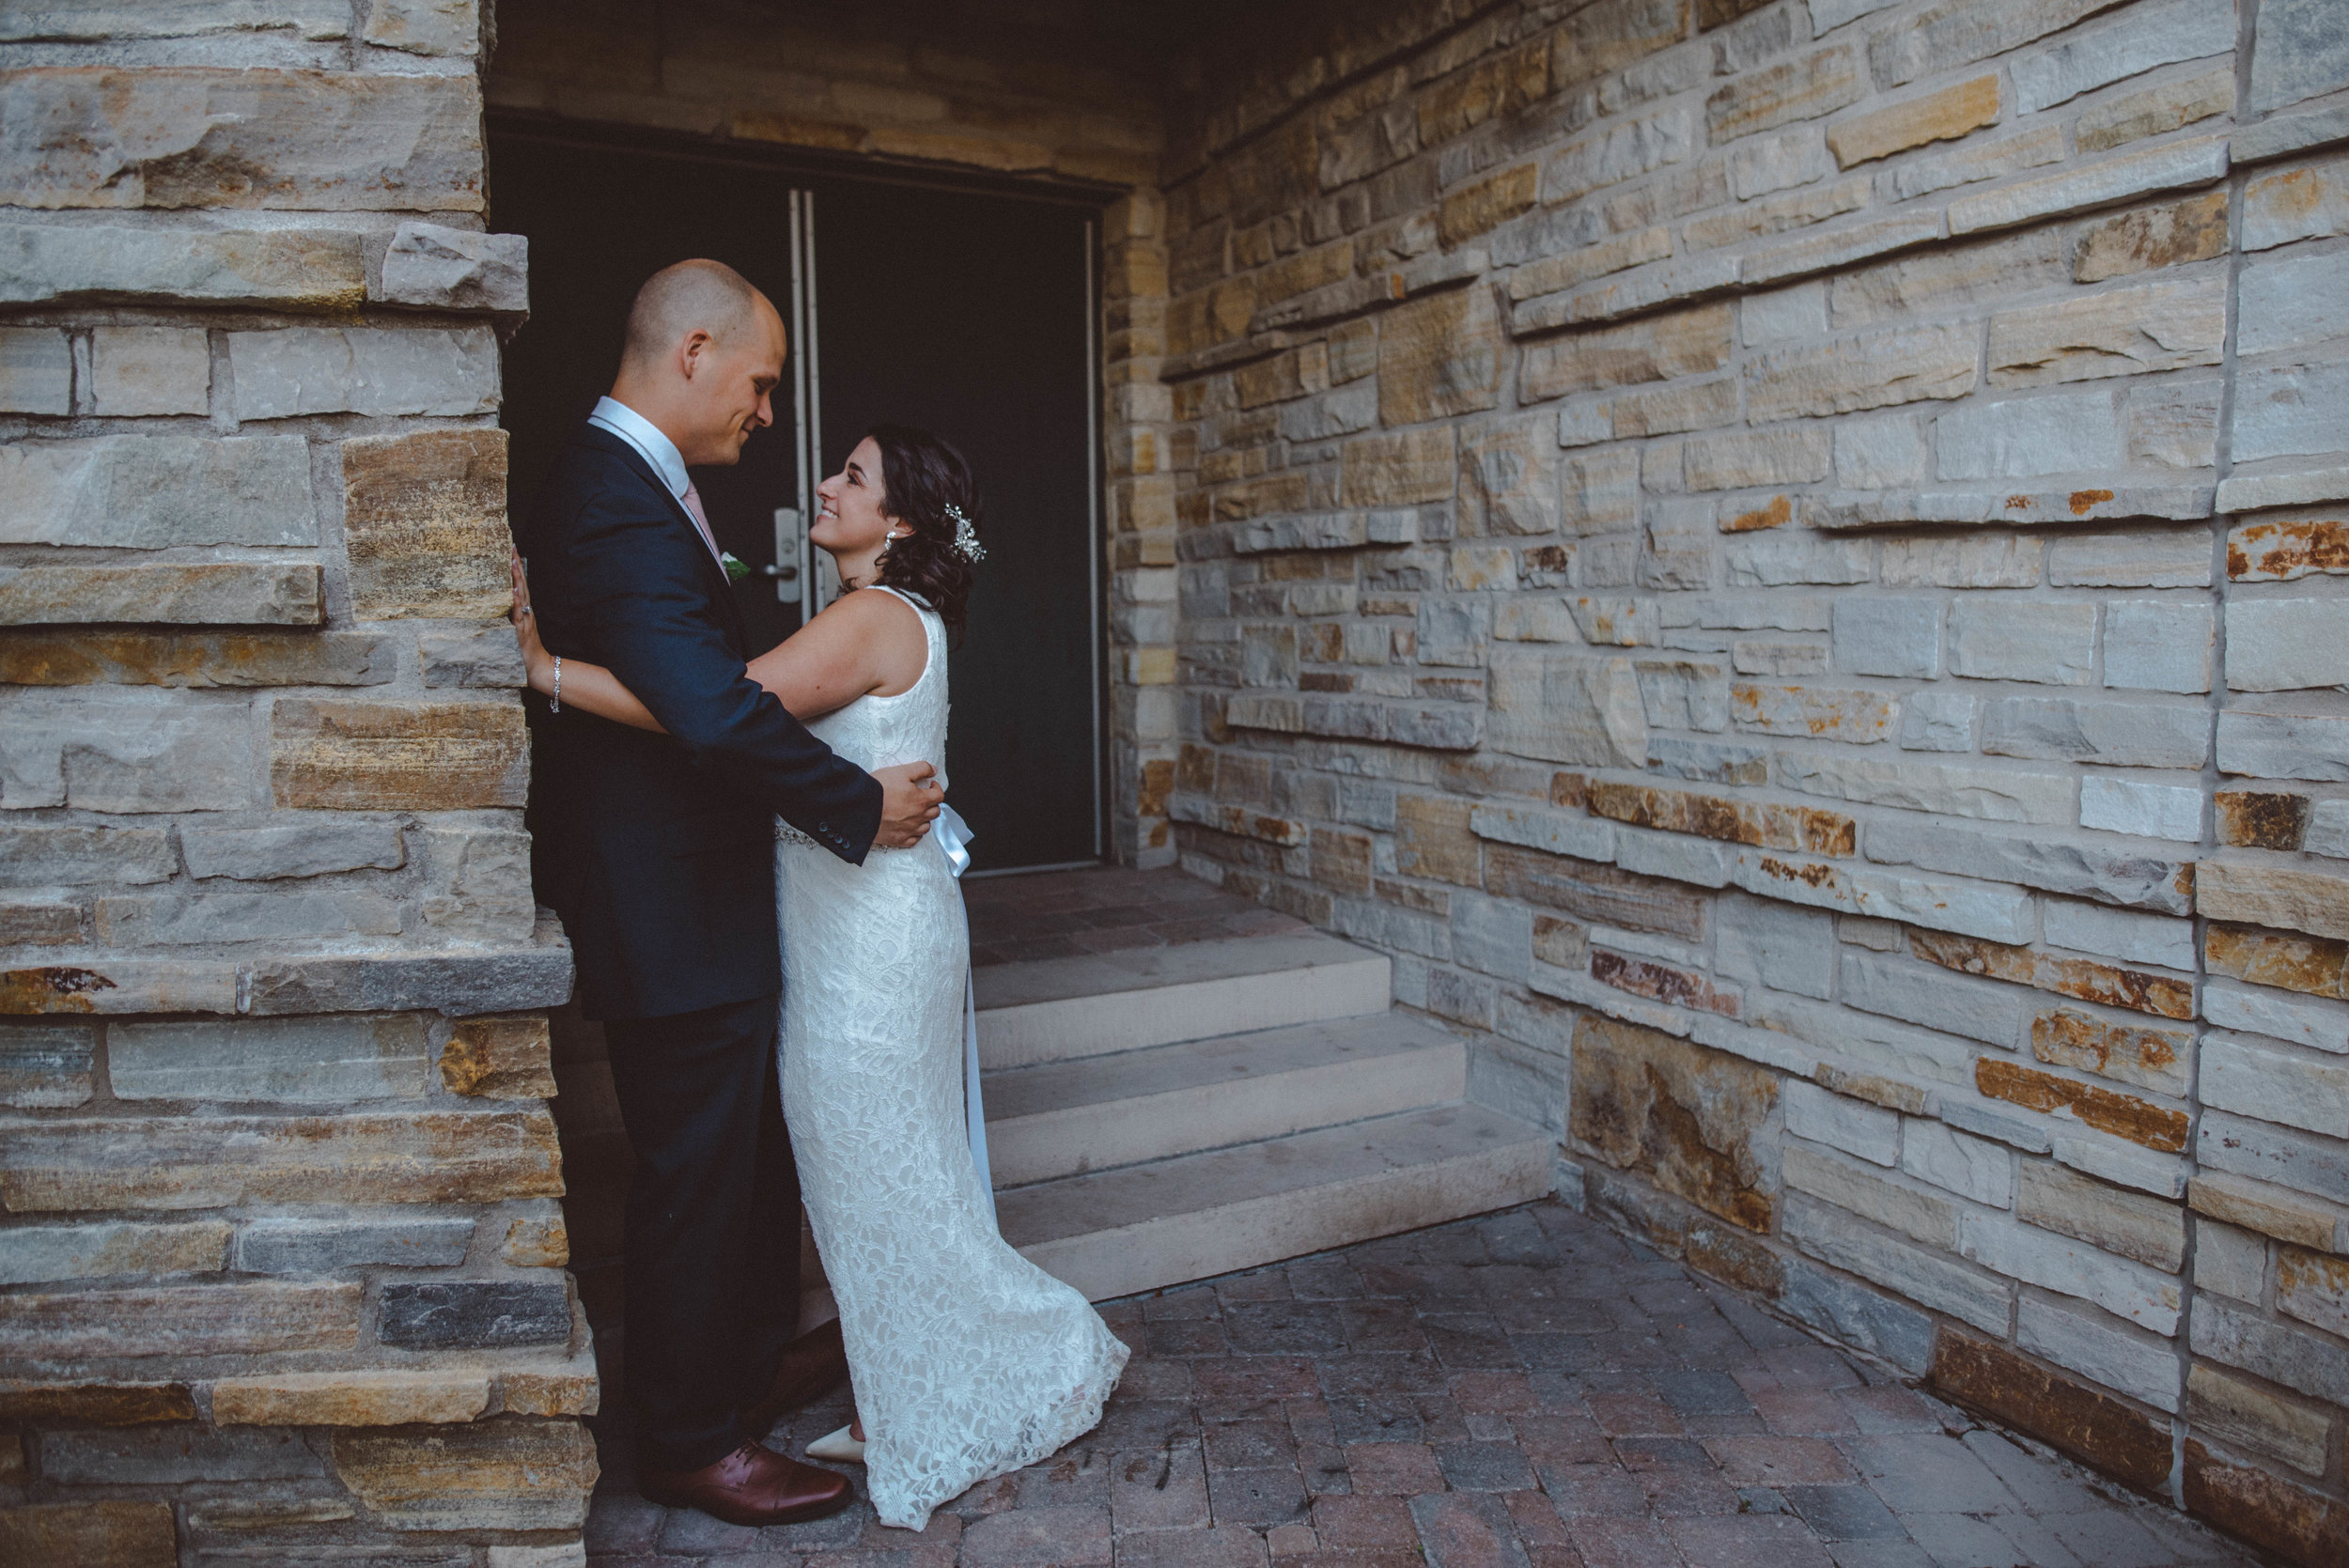 photographe_mariage_gatineau_hull_outaouais_photographer_ottawa_wedding_hilton-14.jpg